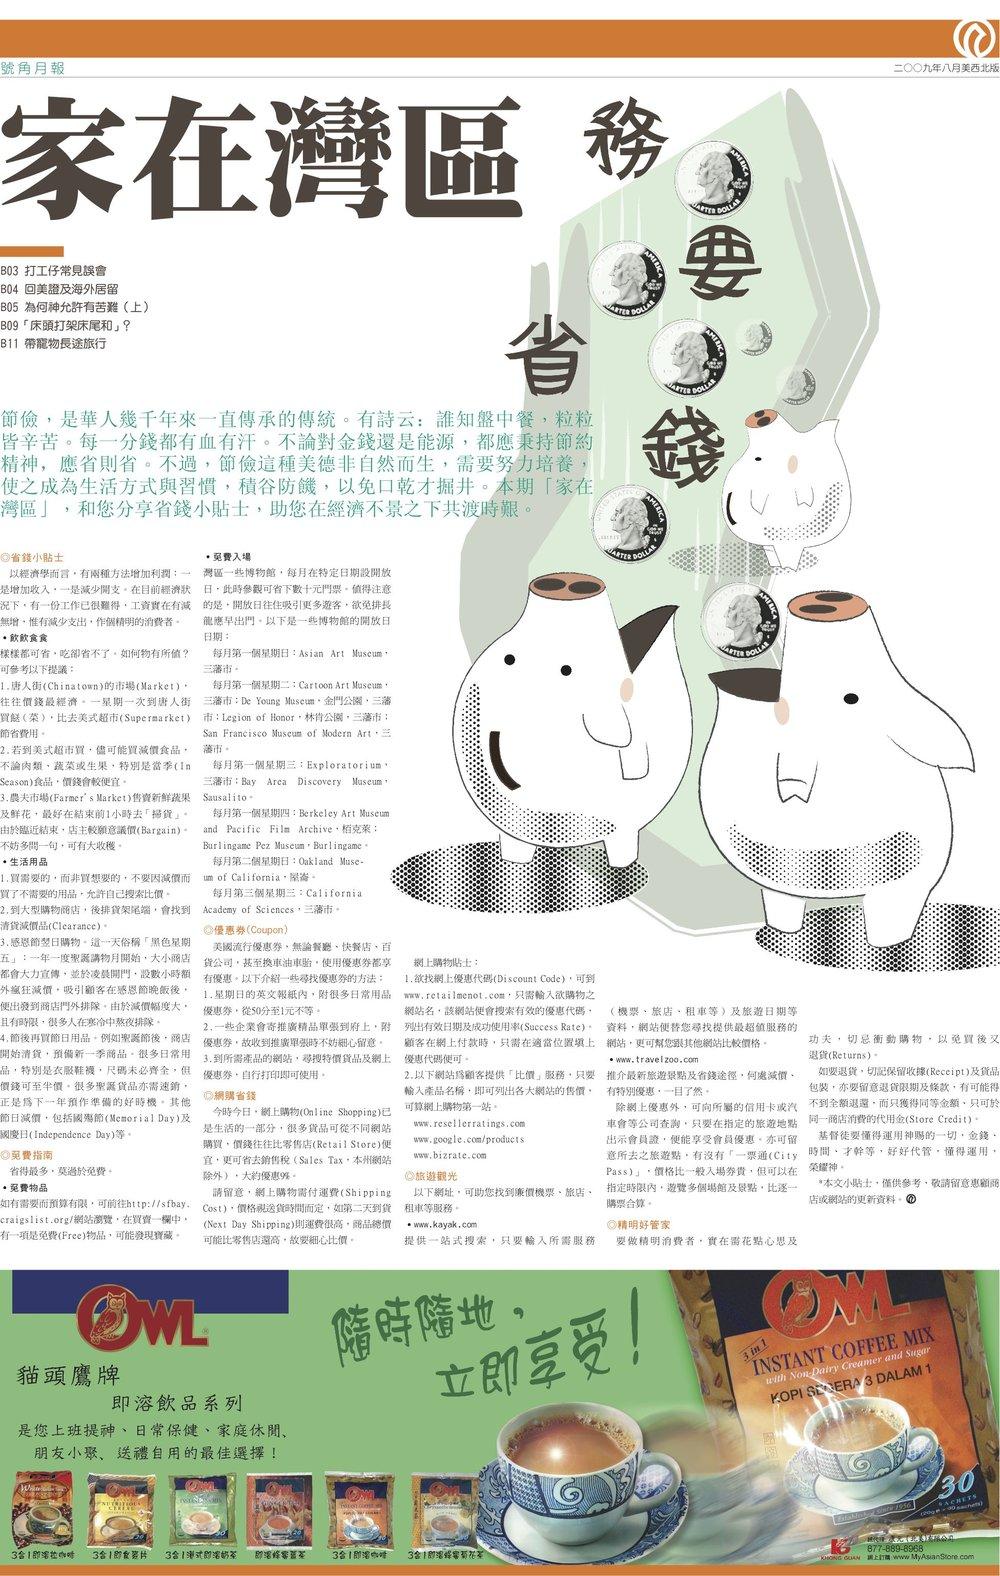 CCHC3.jpg